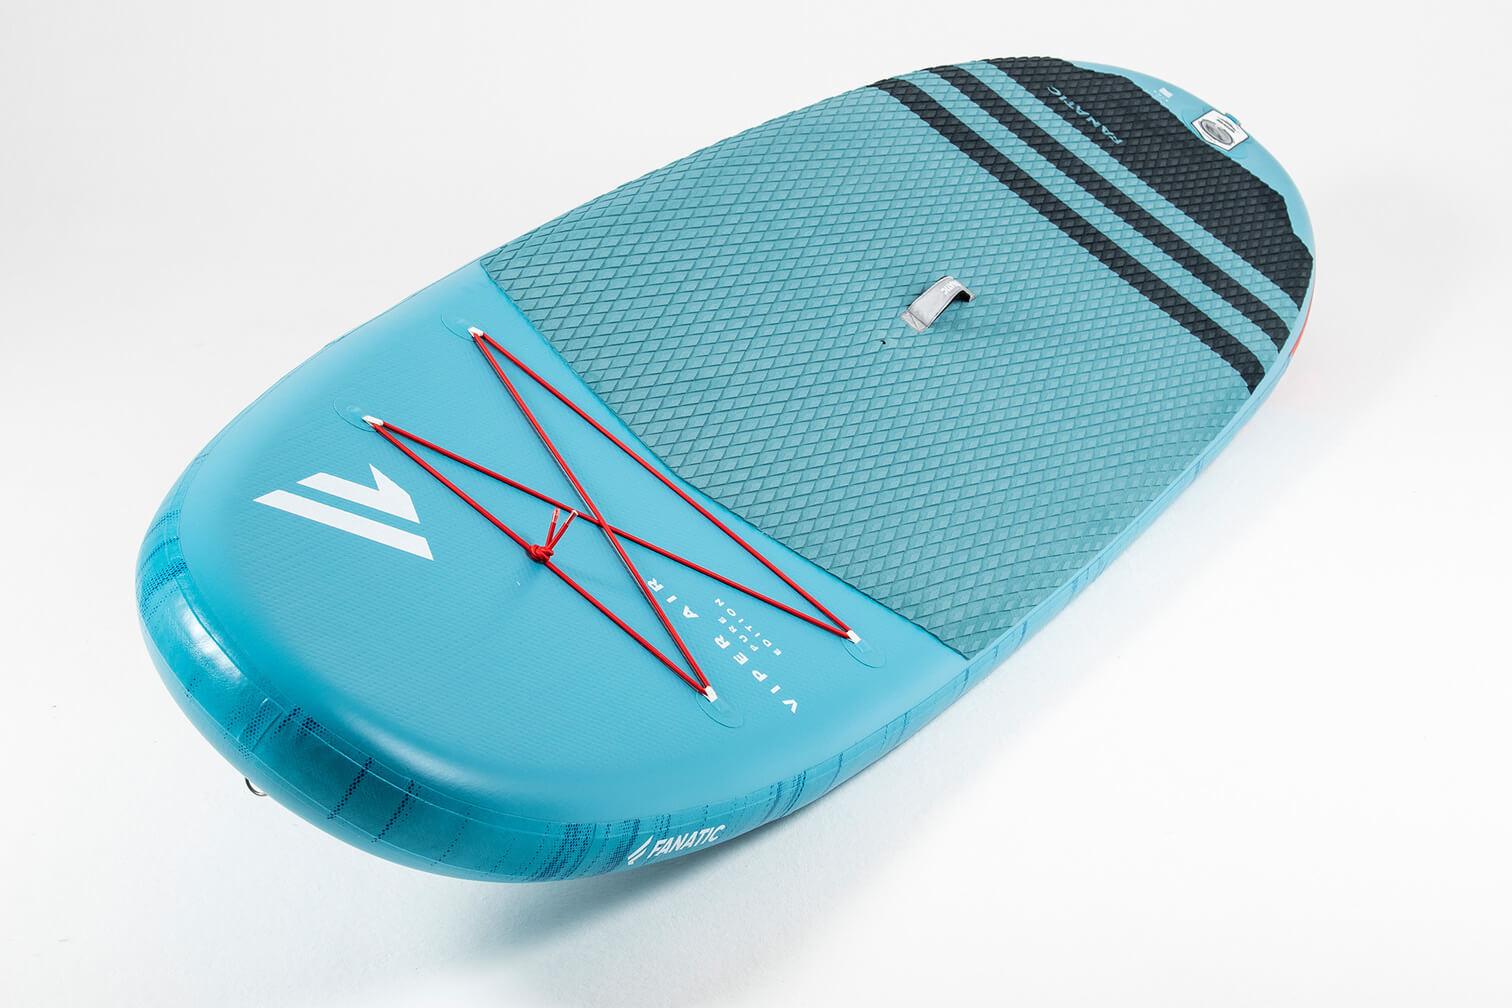 Viper Air Windsurf